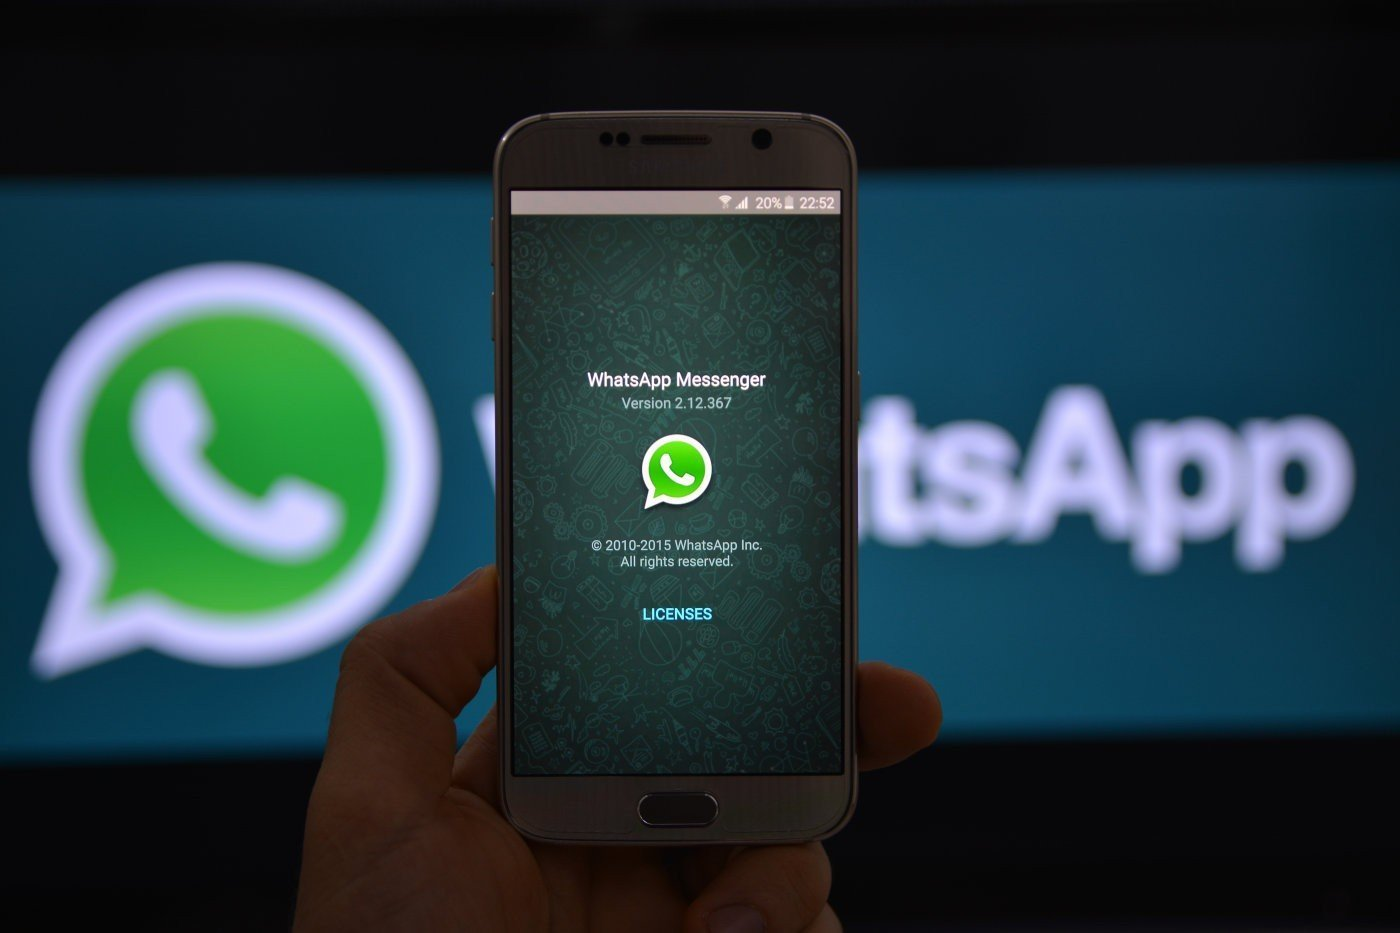 o-telefonlara-sahip-olanlar-artik-whatsapp-kullanamayacak